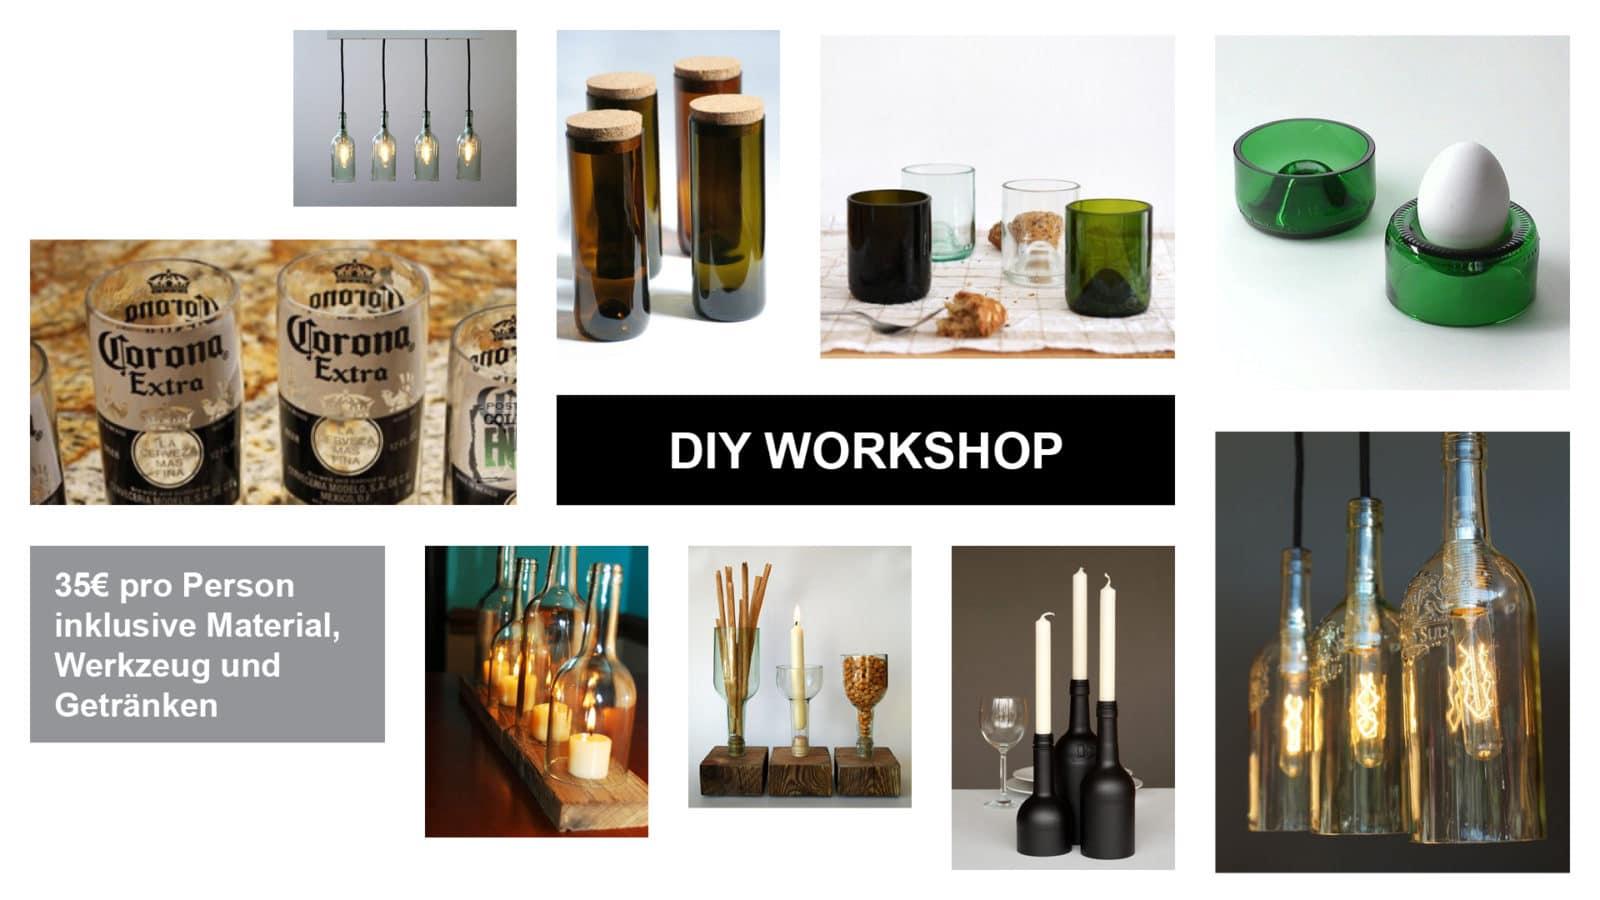 Kurs diy workshop interior design accessoires aus for Interior design kurs